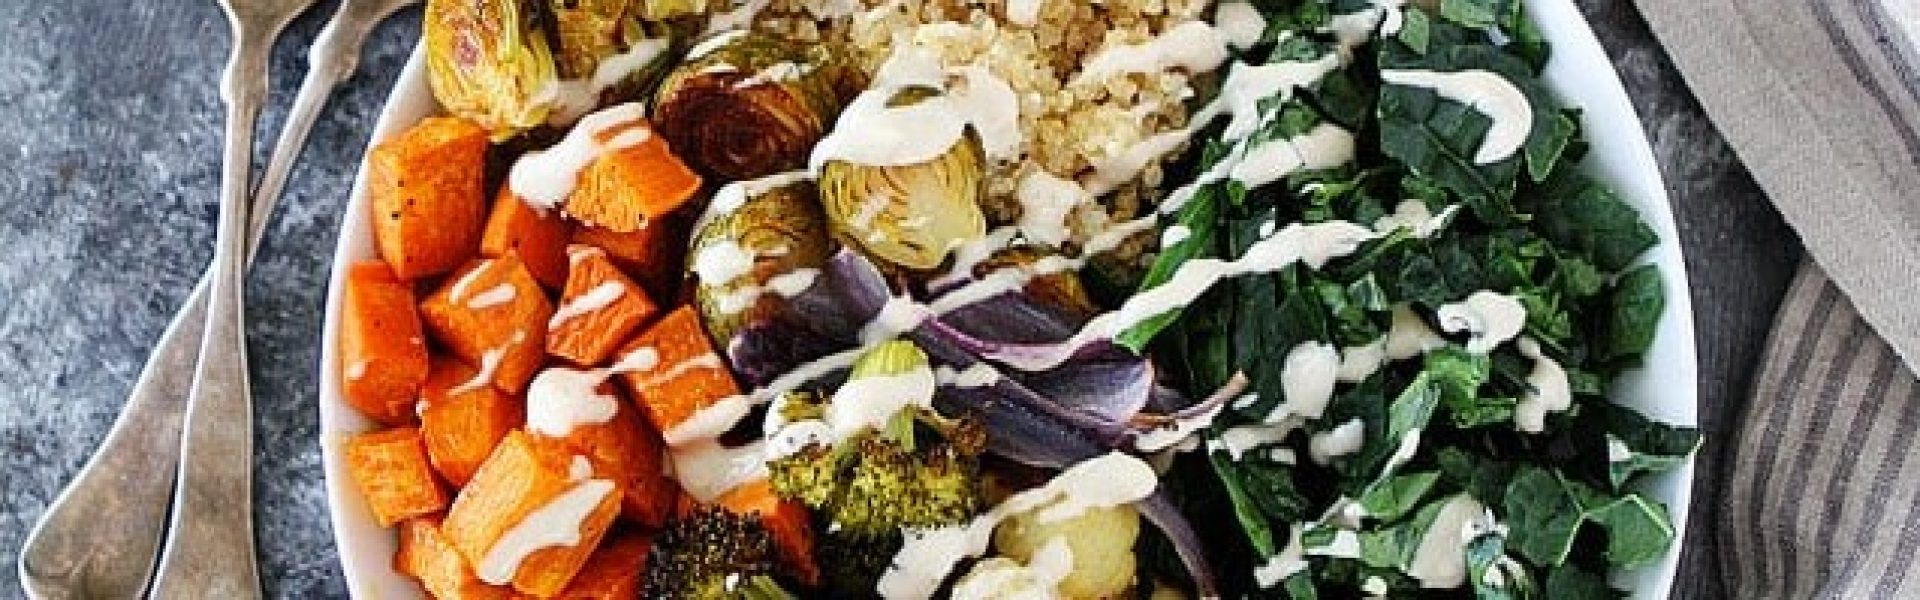 Roasted-Vegetable-Quinoa-Bowls-5